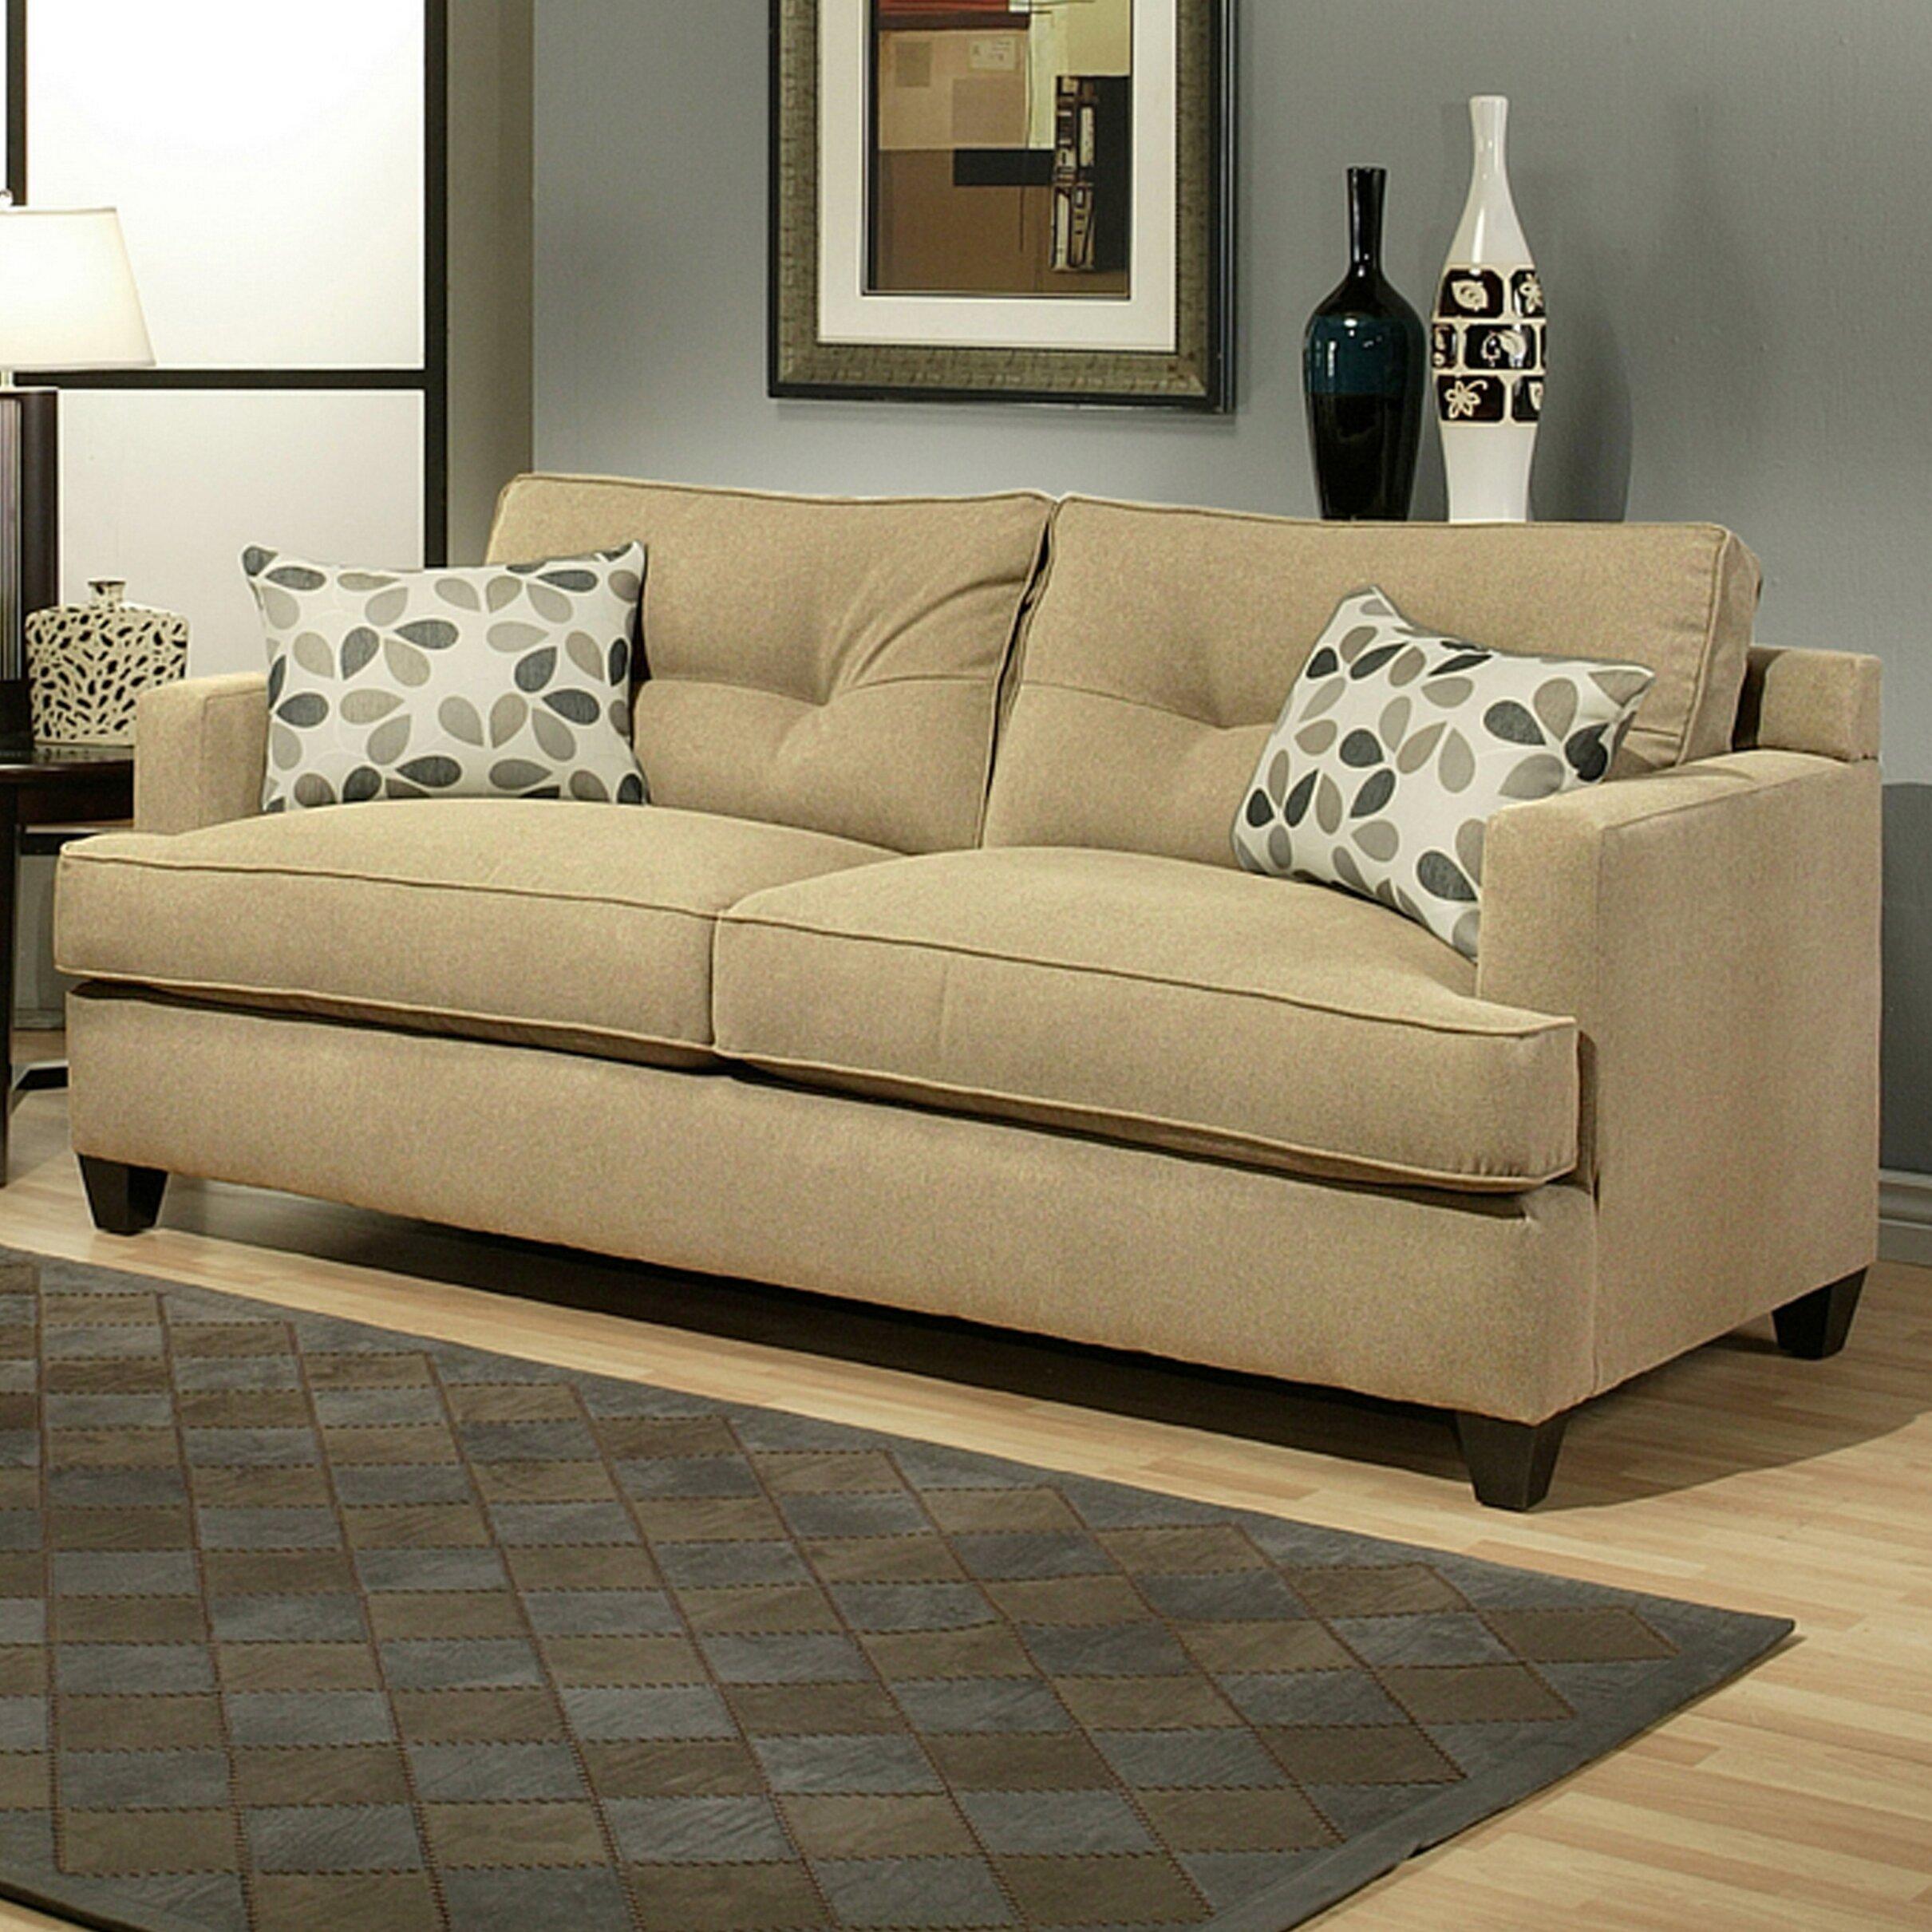 Hokku designs dawn sofa reviews wayfair for Hokku designs living room furniture